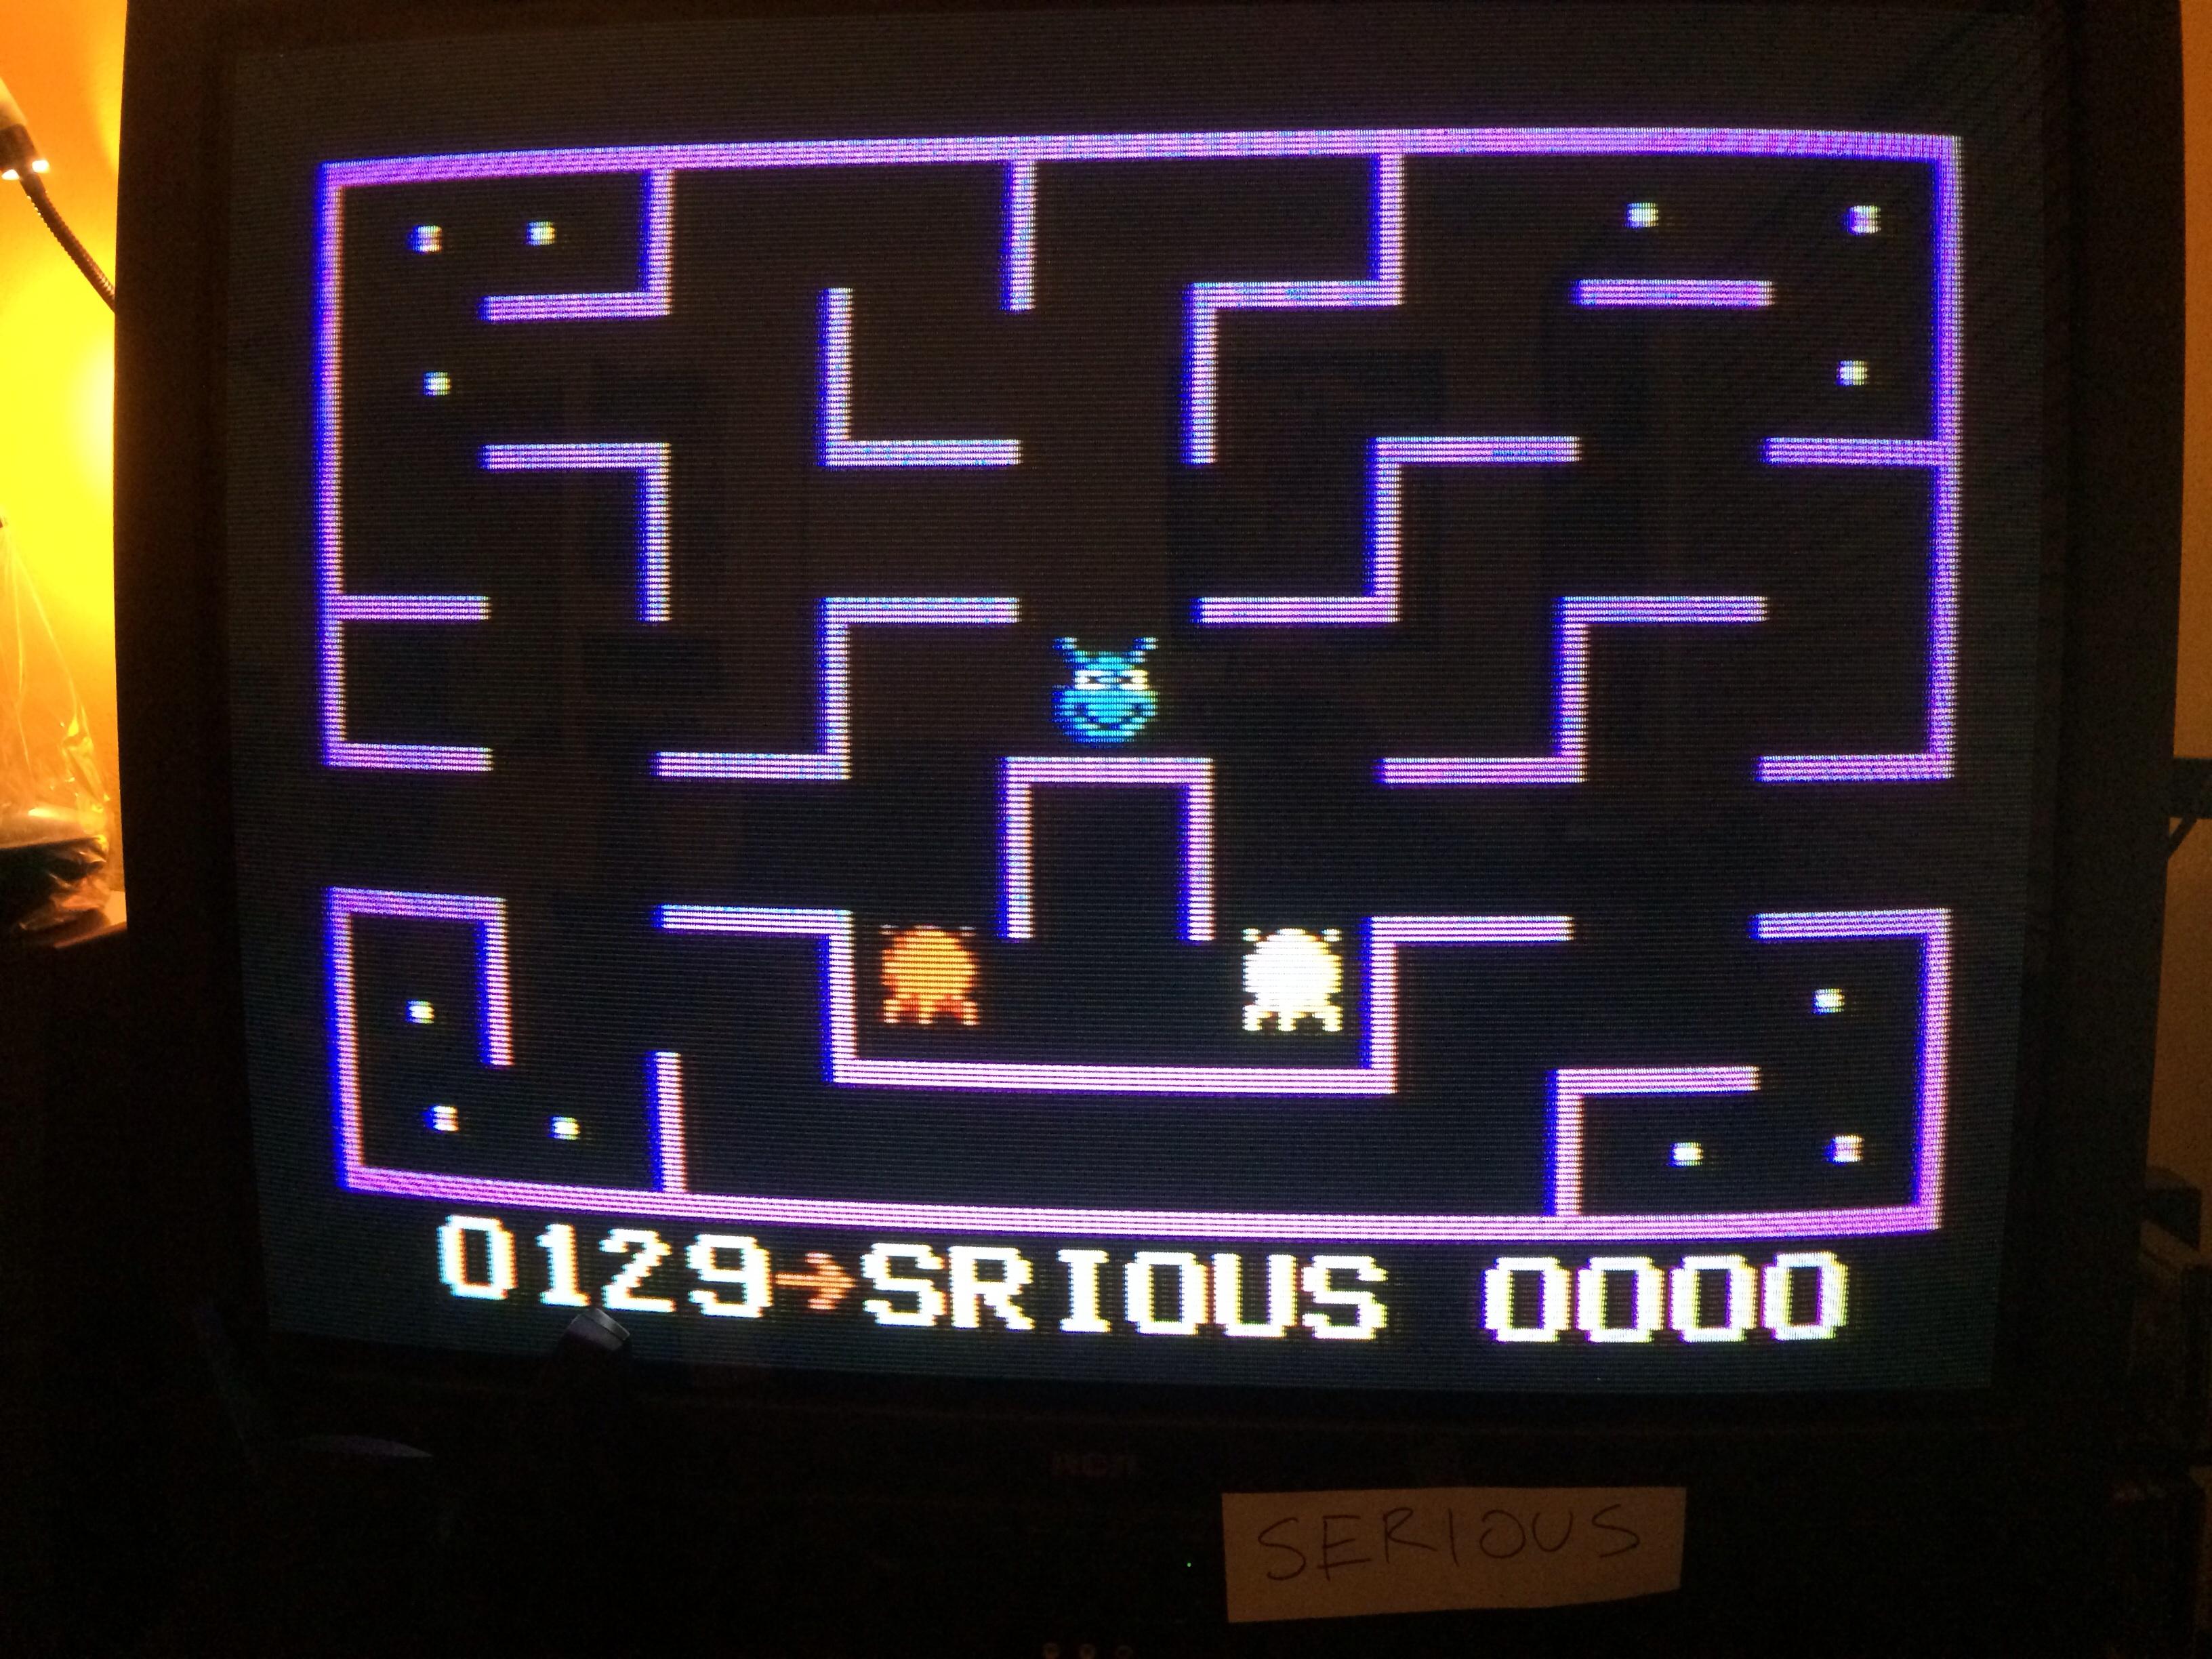 Serious: K.C. Munchkin: Maze 1 (Atari 7800) 129 points on 2015-01-11 20:39:04